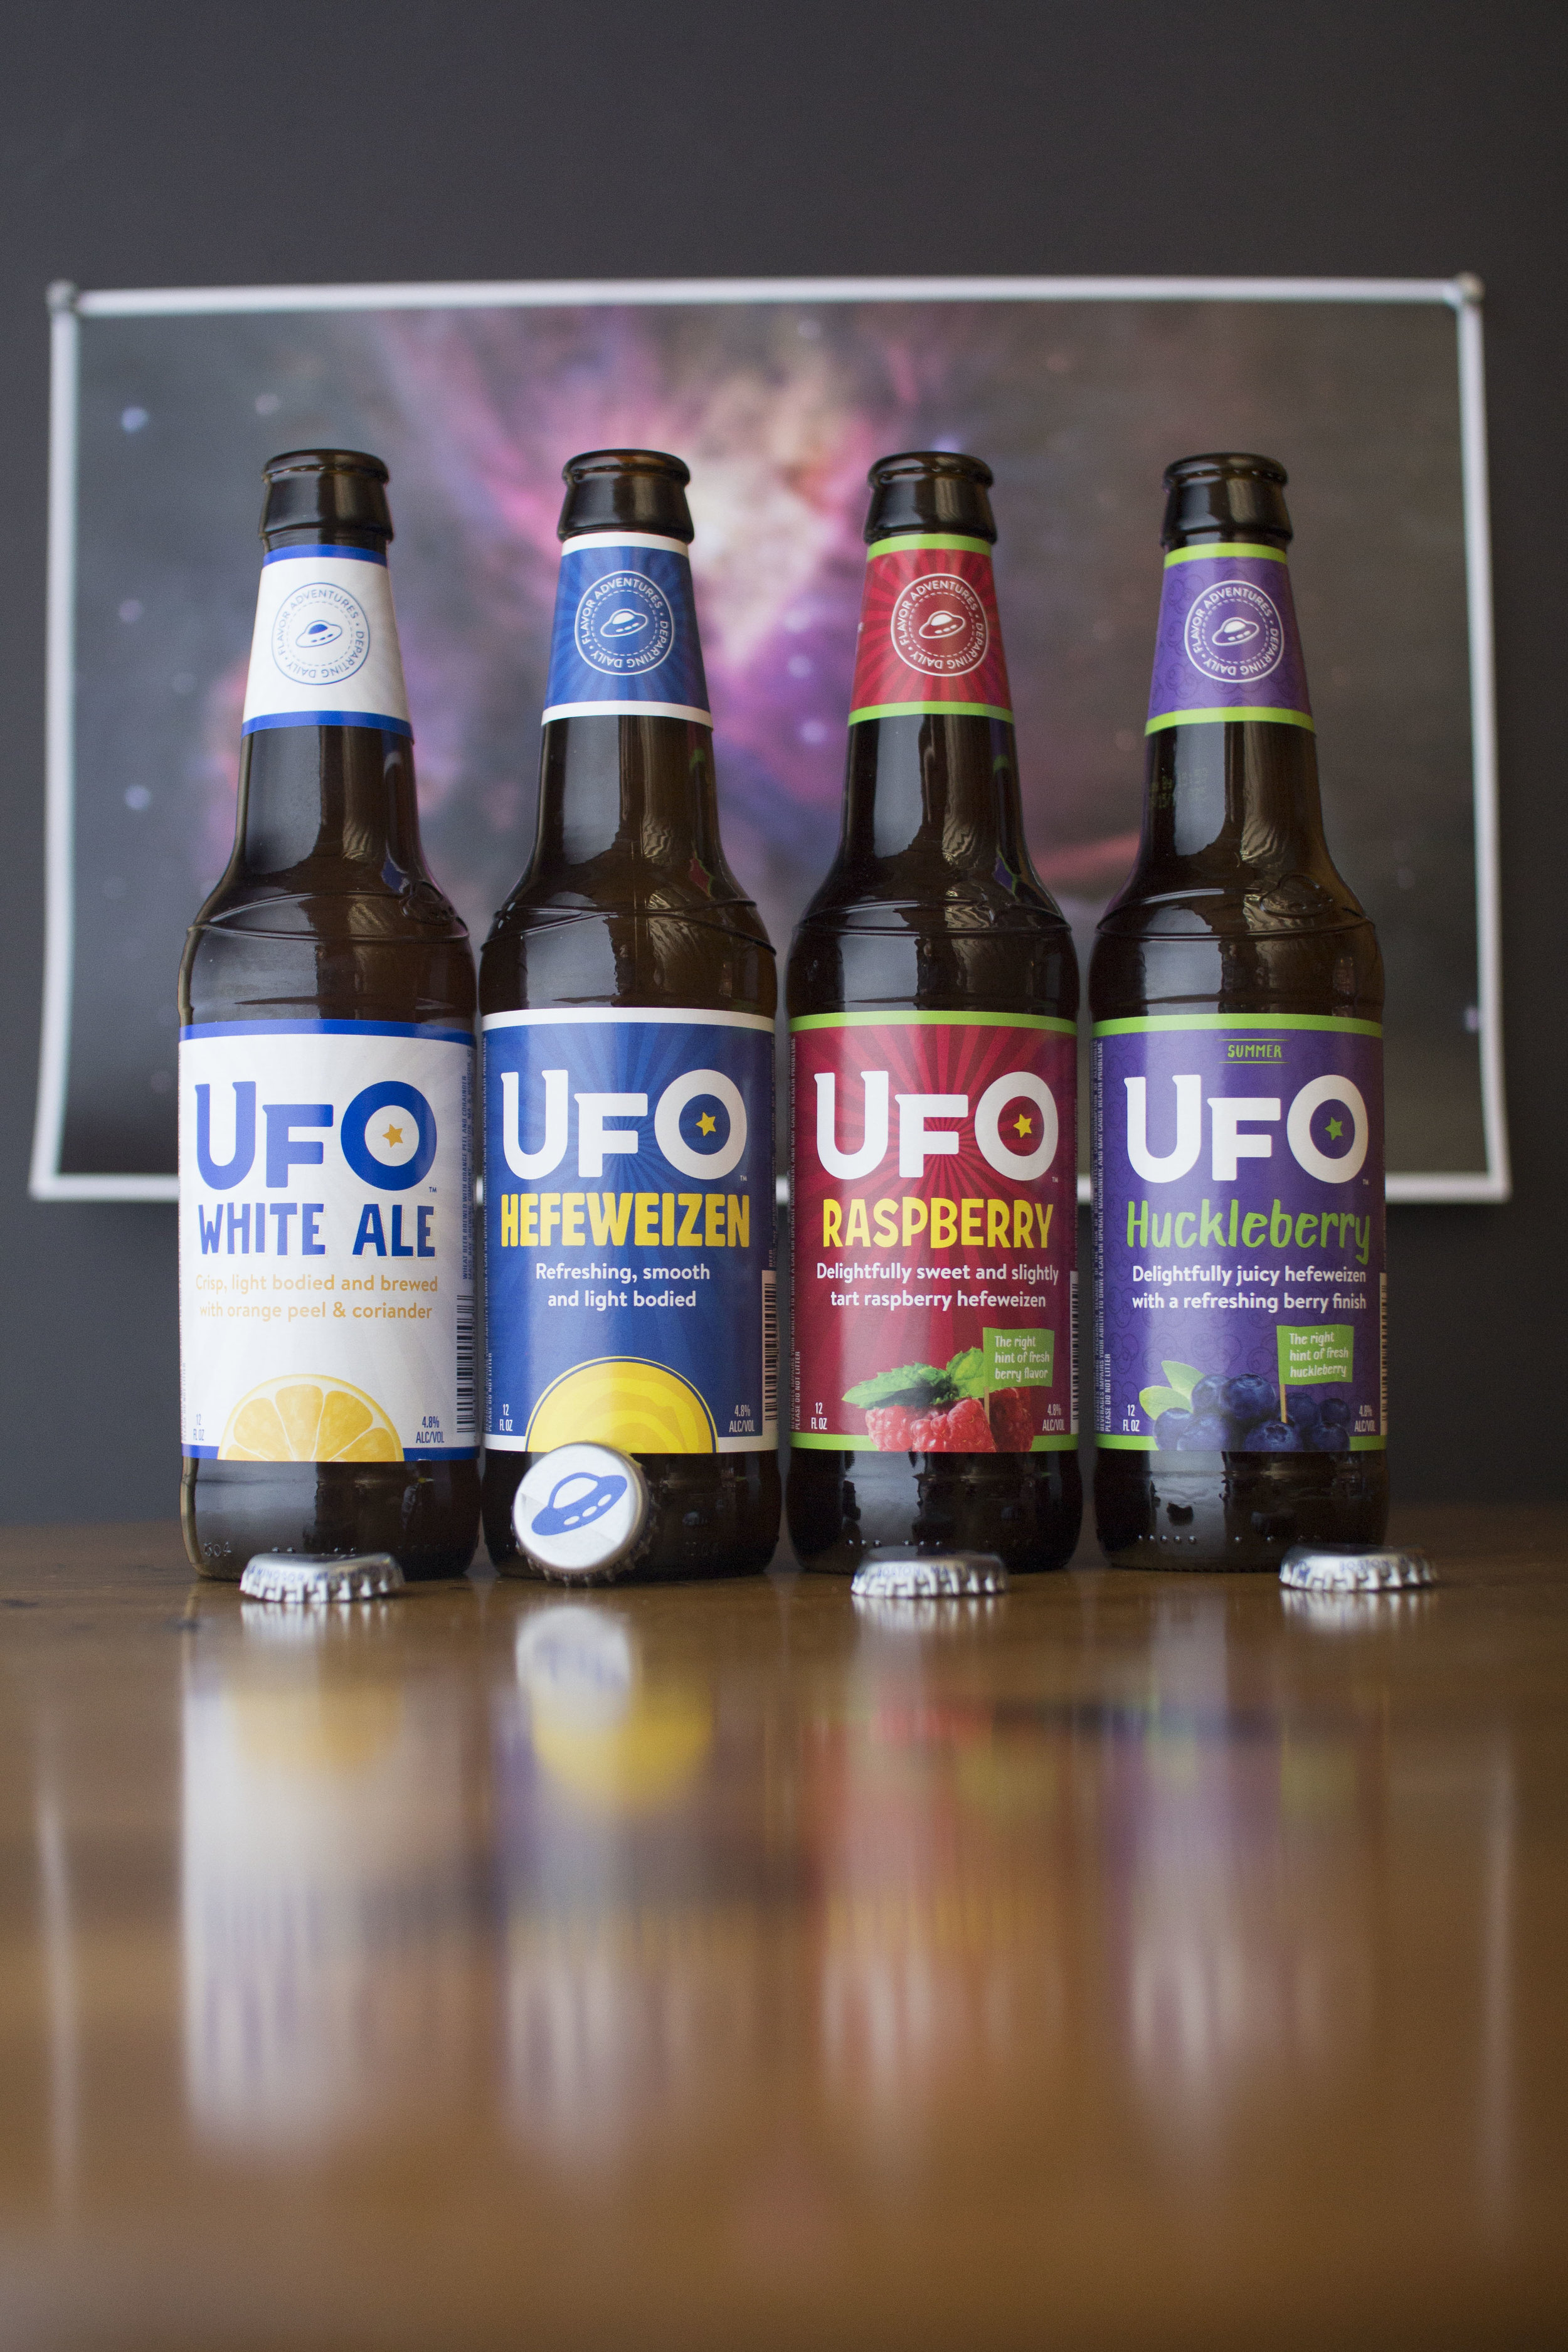 Rebranded bottle packaging, UFO beer, 2017. Photo courtesy of Harpoon Brewery.